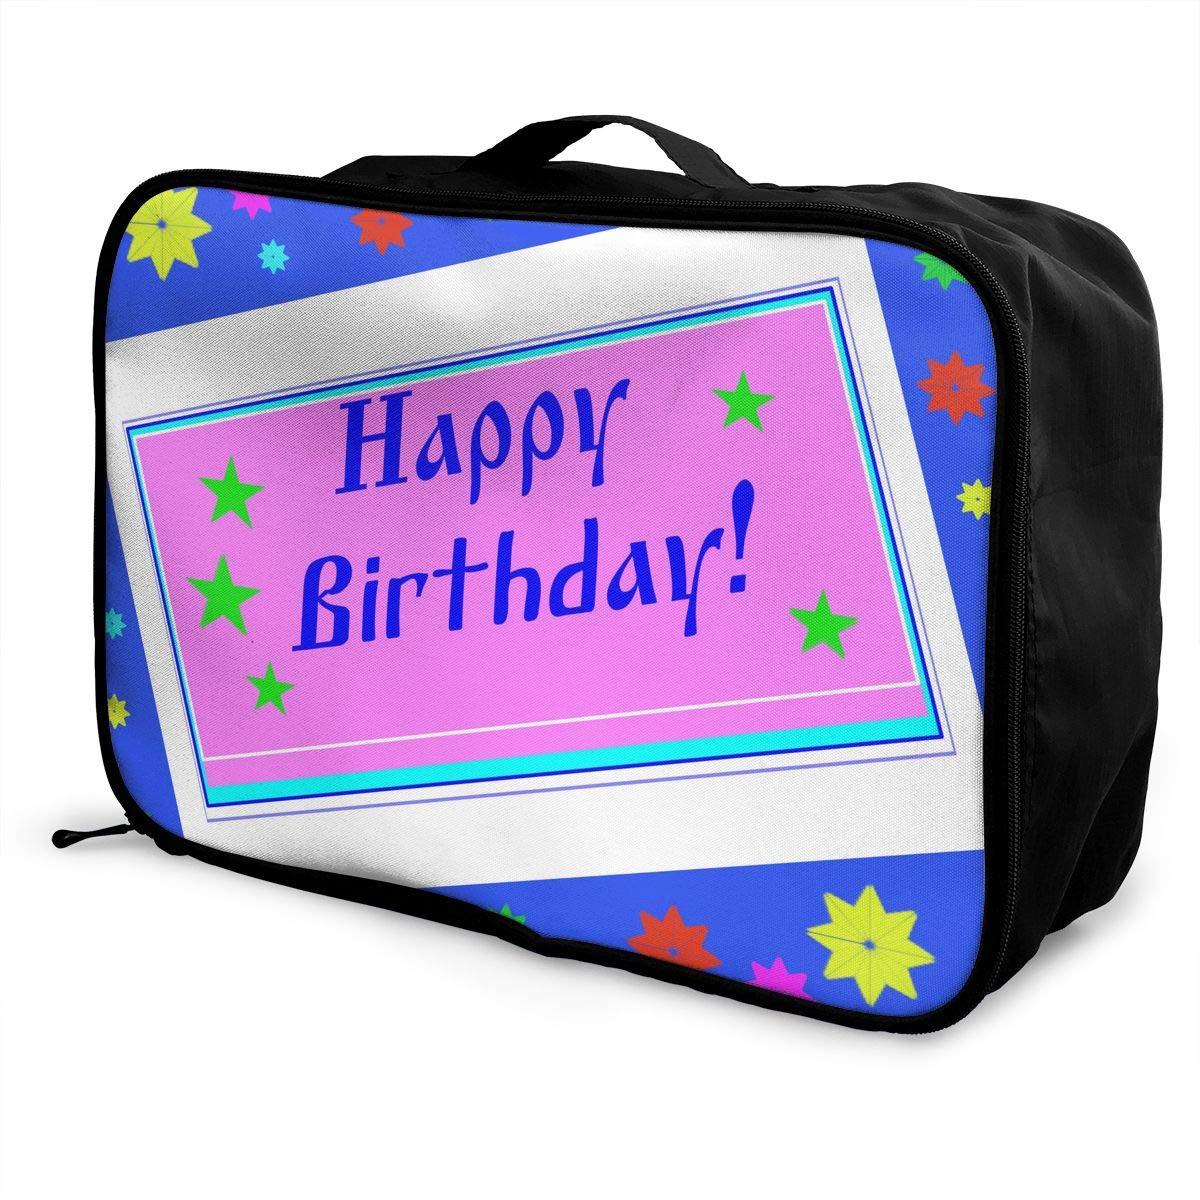 Travel Luggage Duffle Bag Lightweight Portable Handbag Guitar Large Capacity Waterproof Foldable Storage Tote